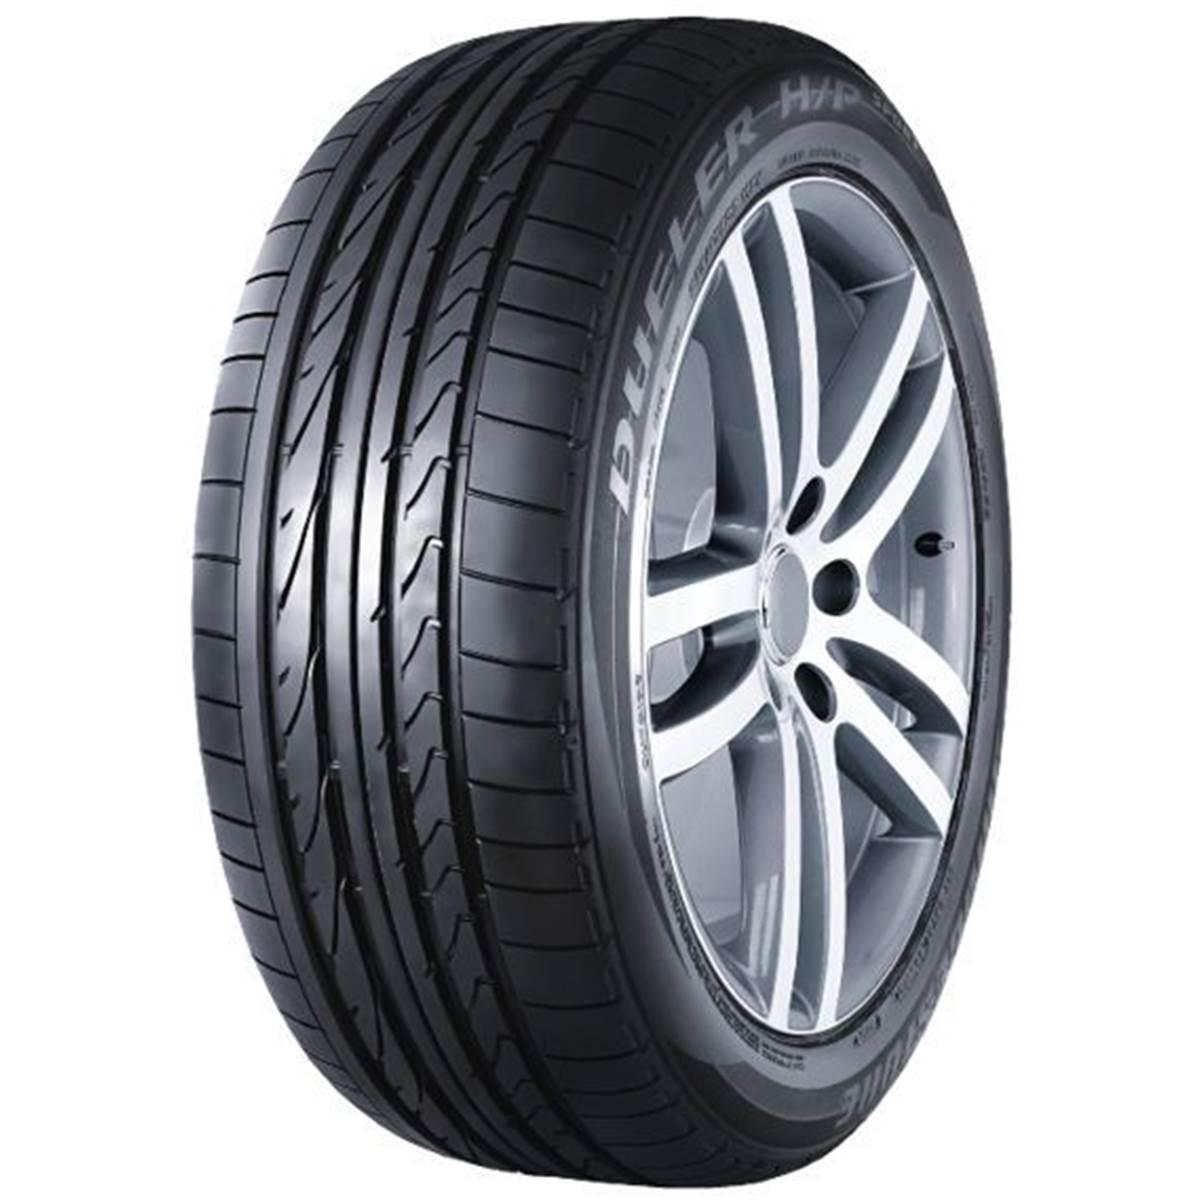 Bridgestone Bridgestone Dueler H/p Sport 235/65 R18 106 W